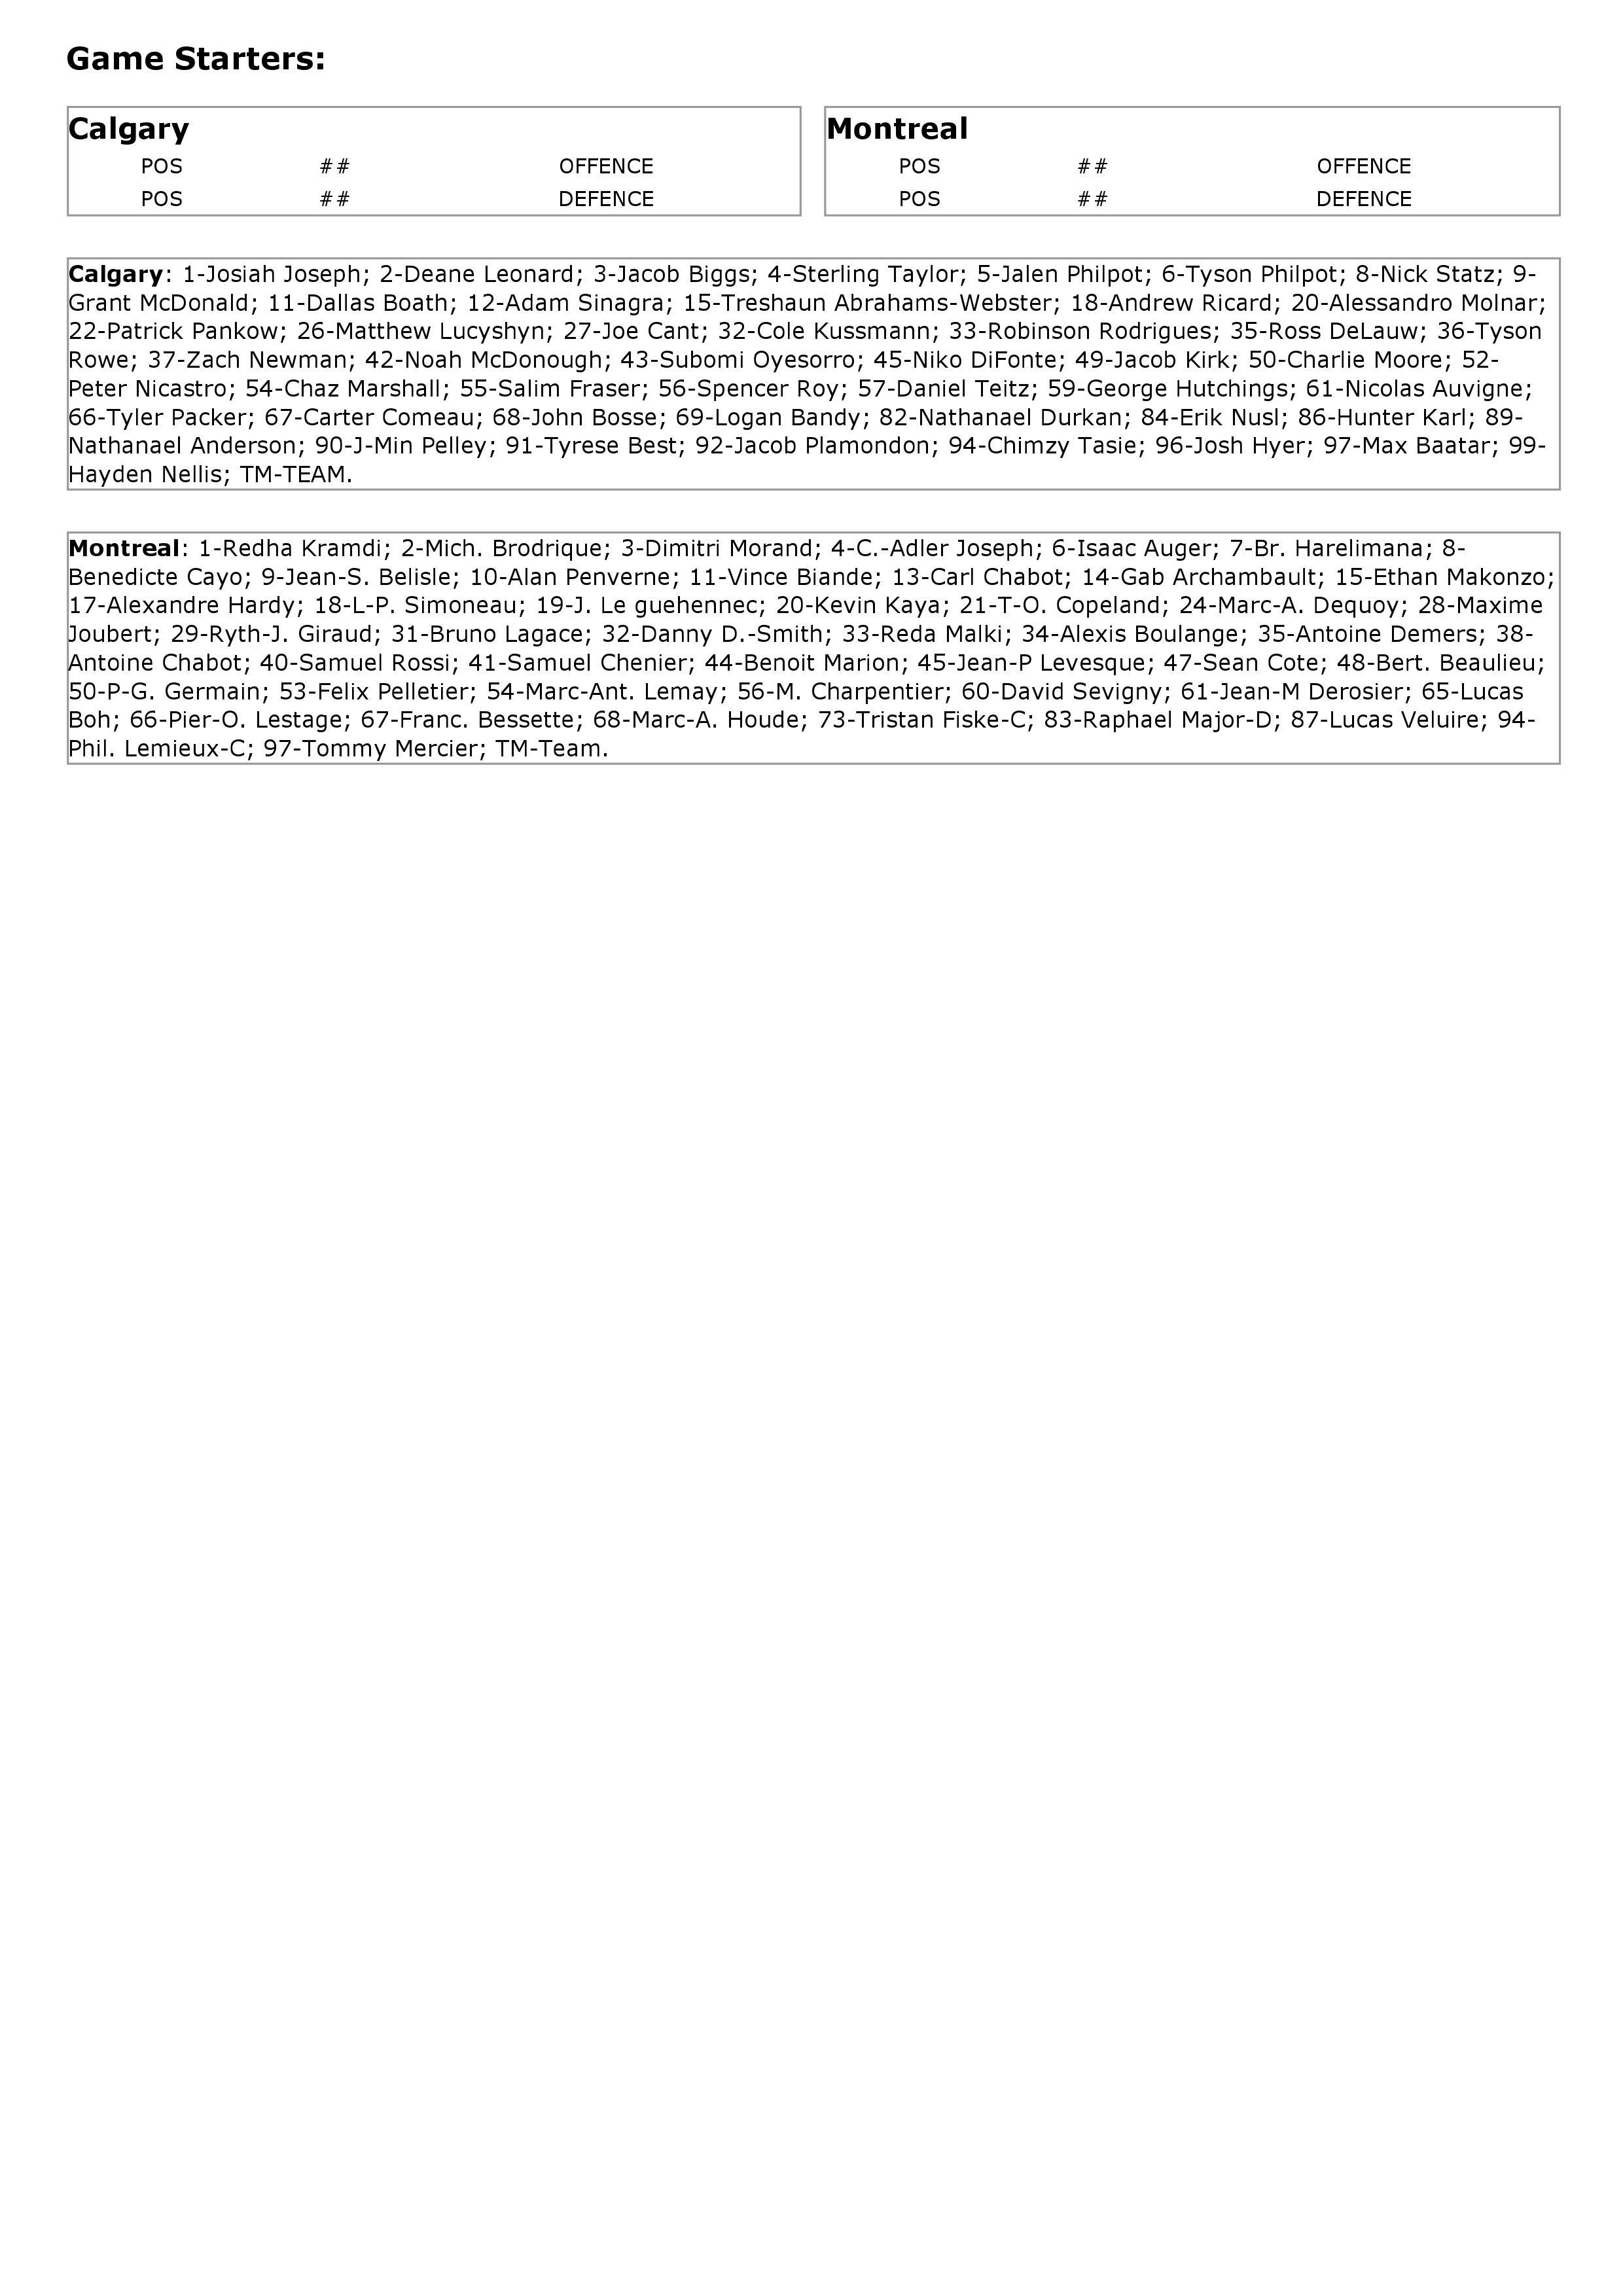 VANIER_CUP_CGY-MTL_STATS_(pg2).jpg (534 KB)